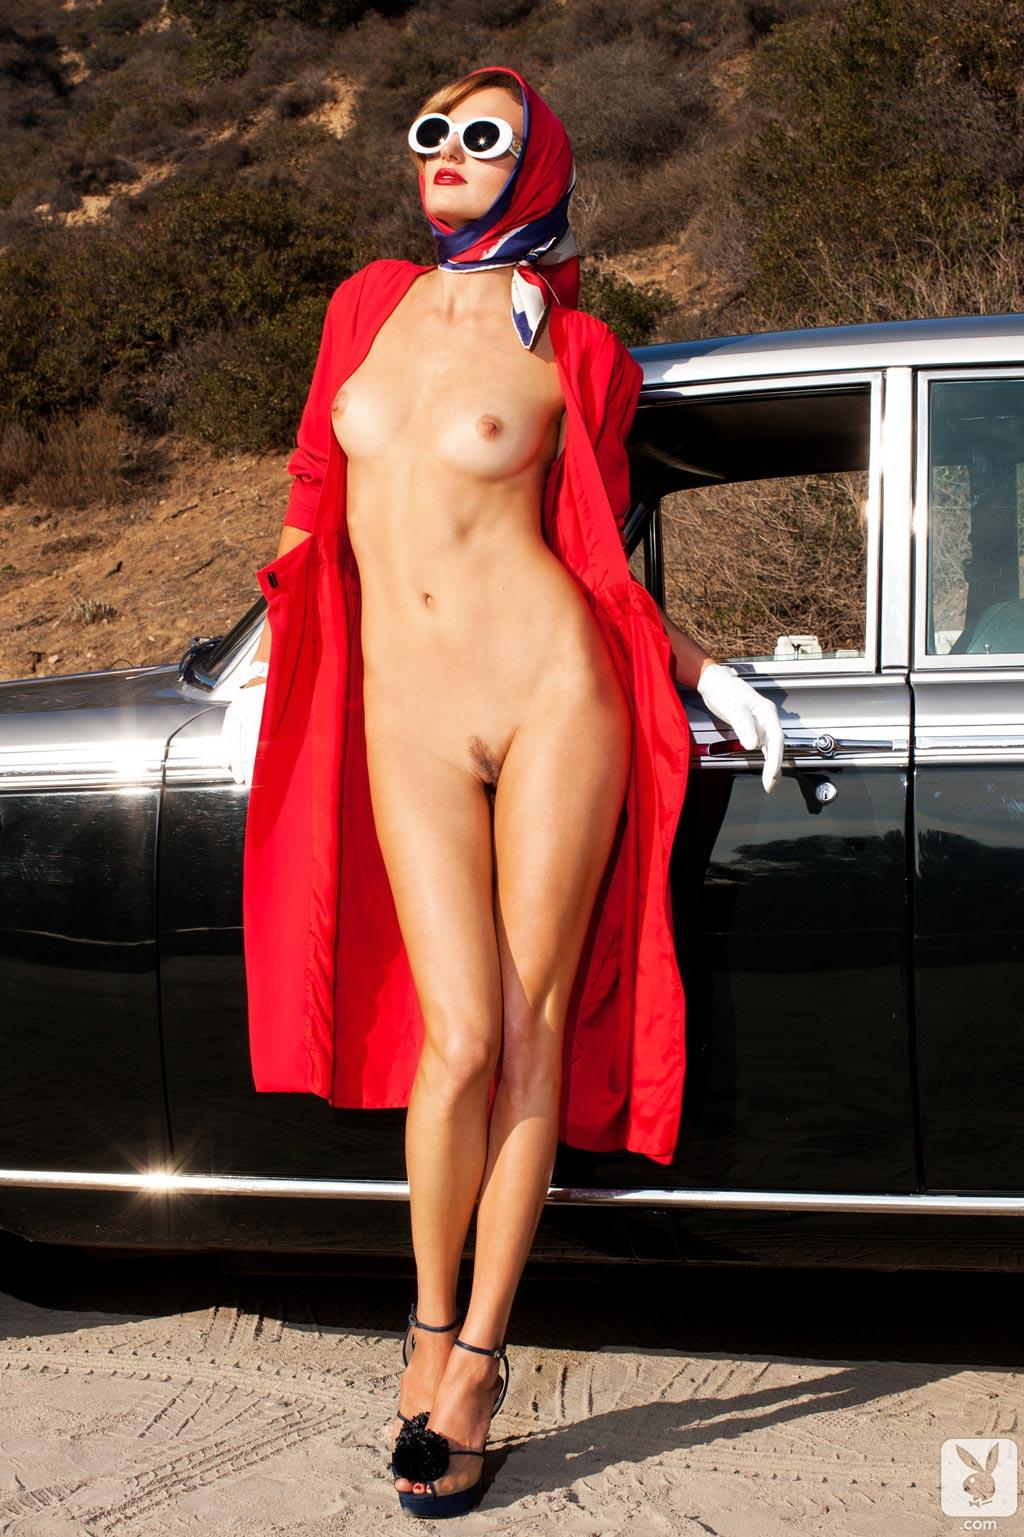 Nude dubai lady — img 1